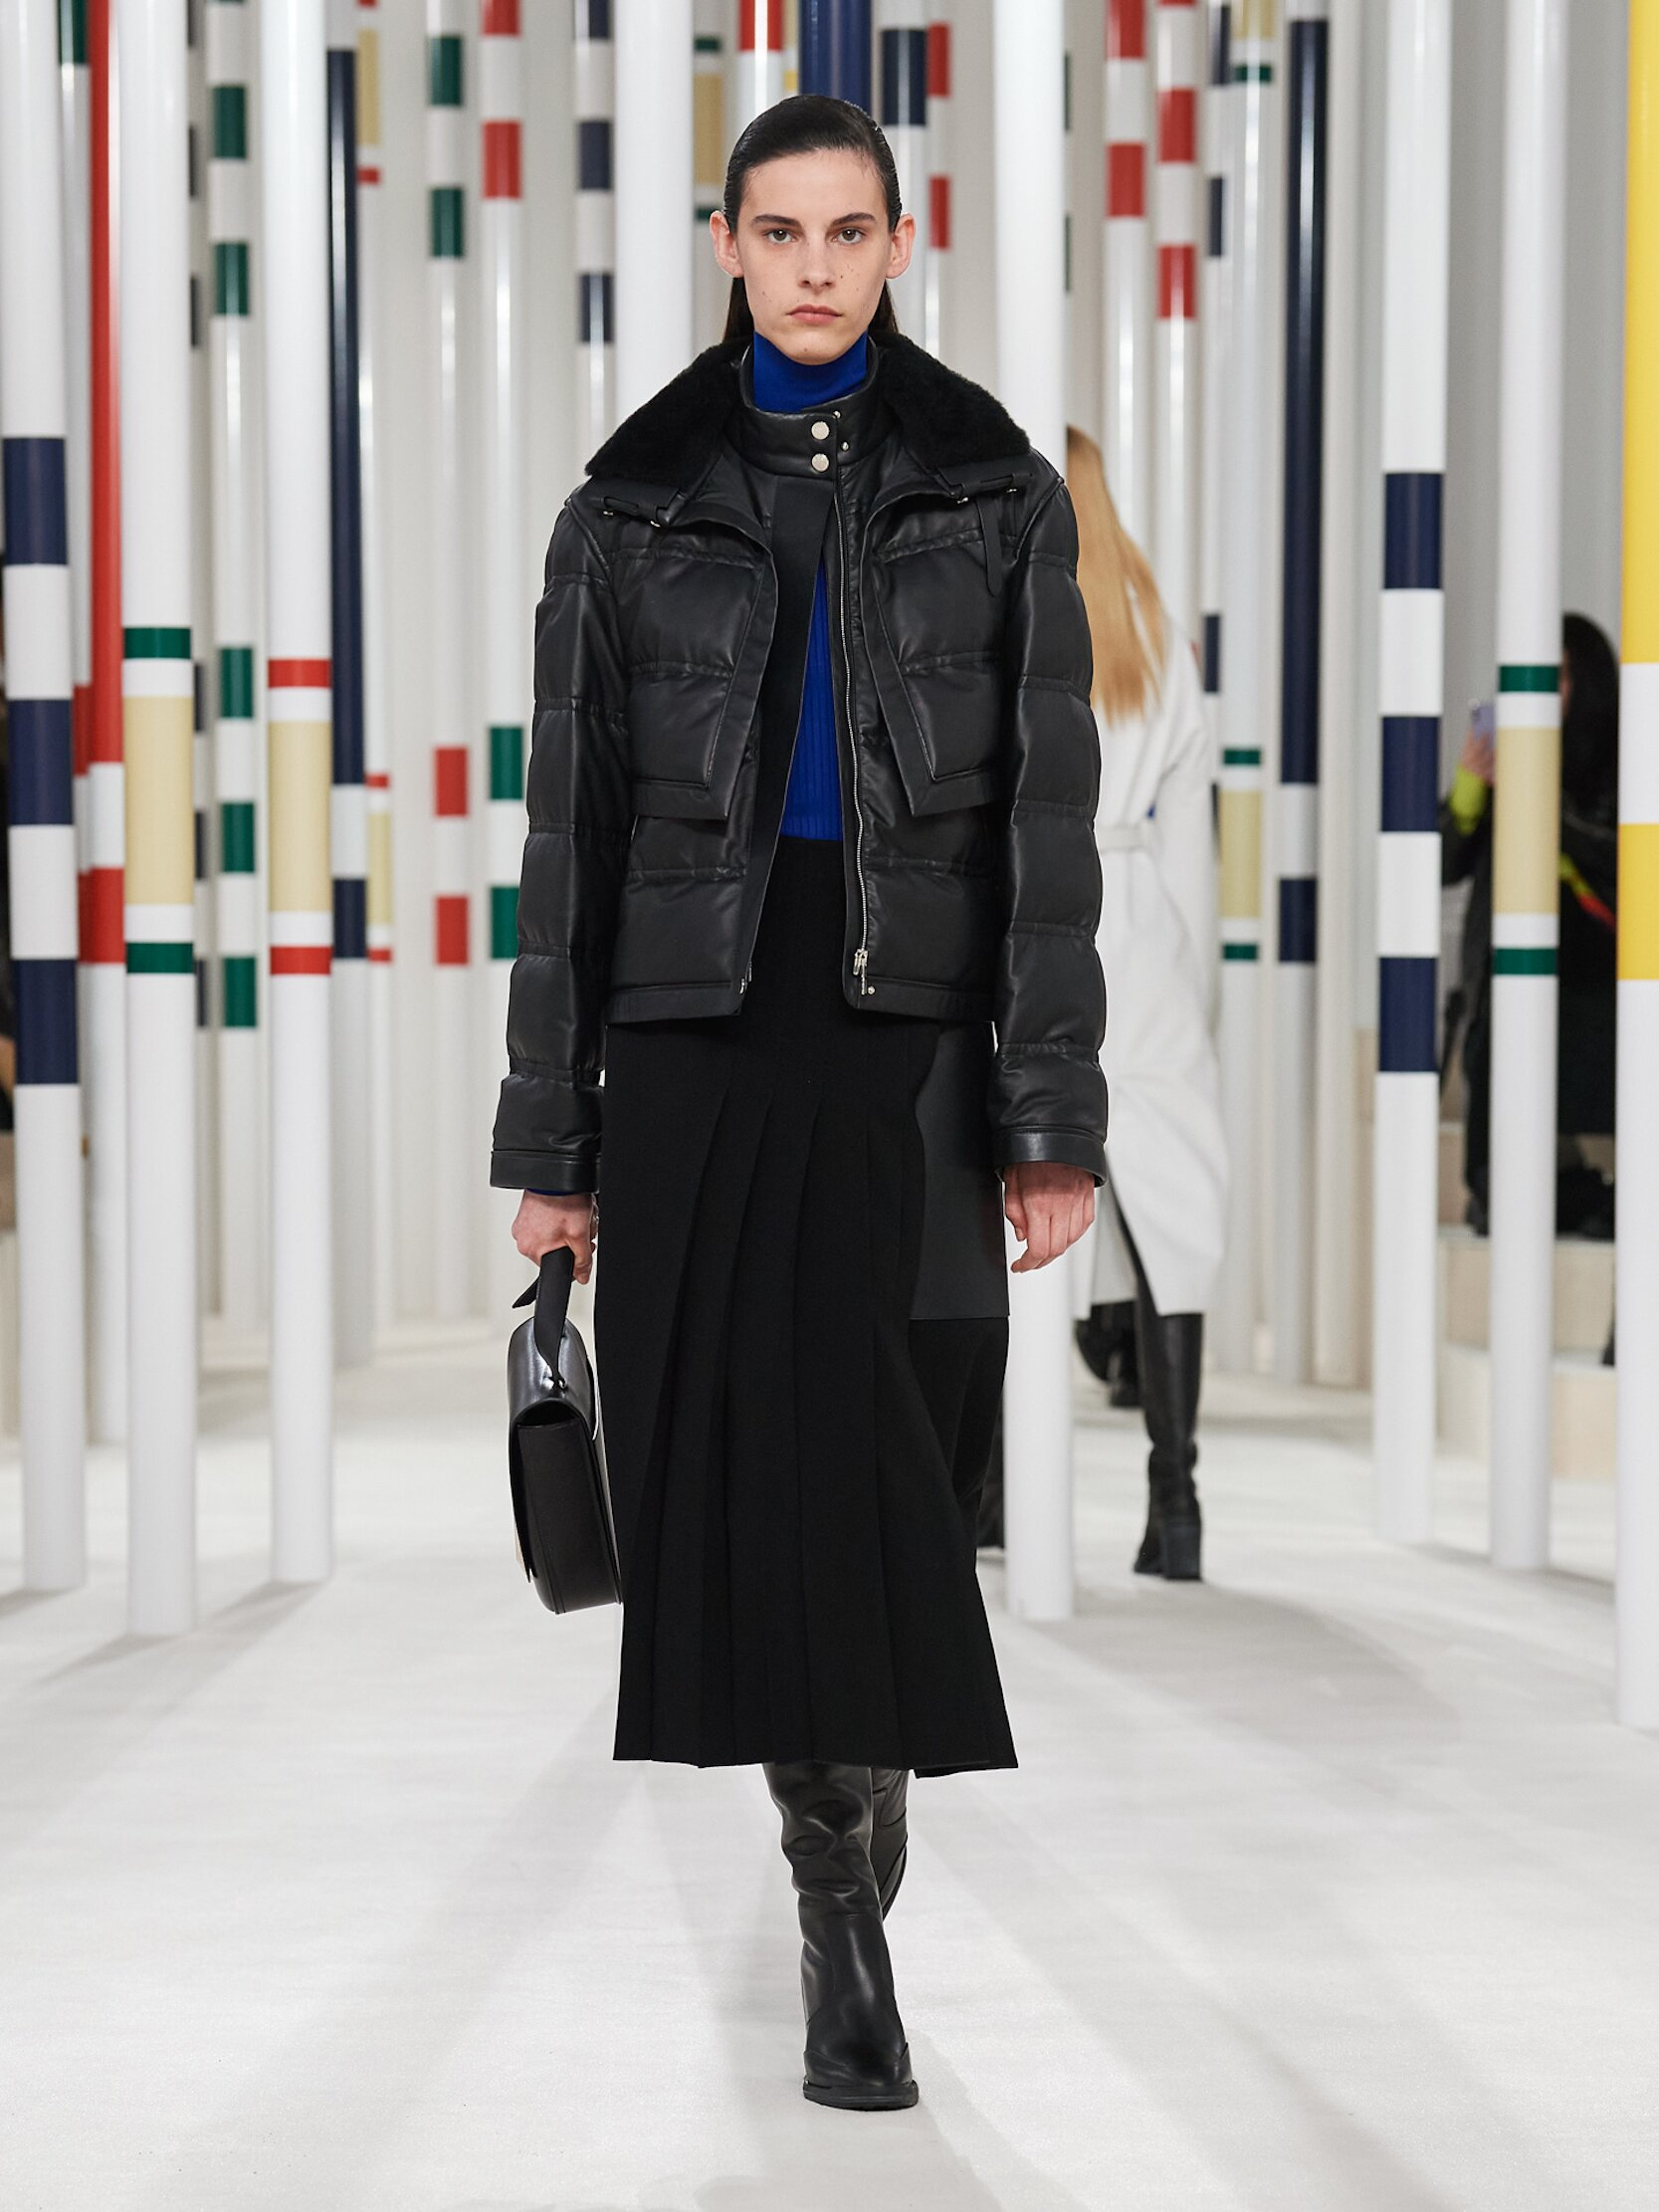 Hermès Women's Collection 2020-21